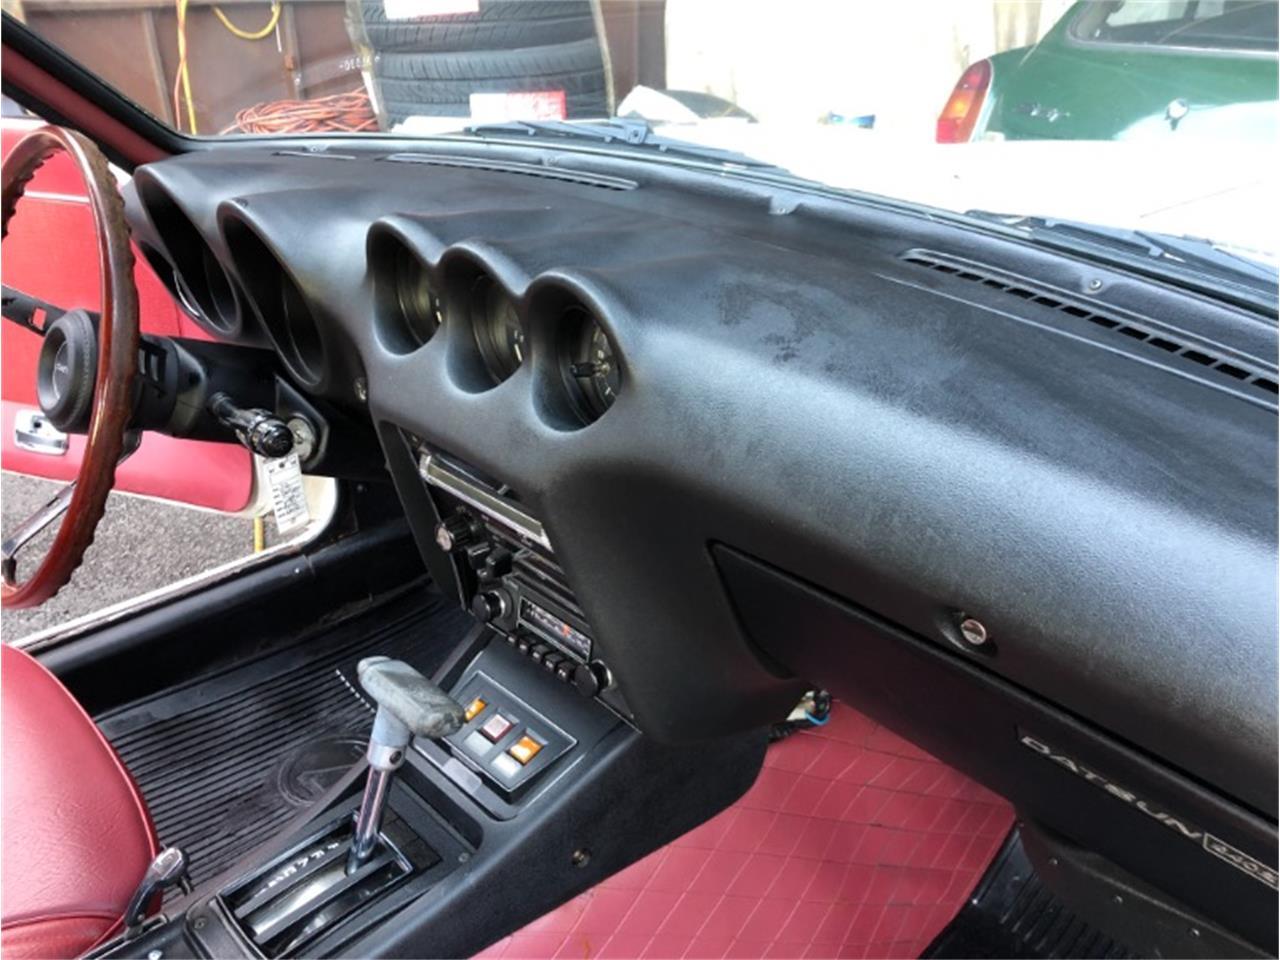 Large Picture of '72 Datsun 240Z located in California - $16,750.00 - Q5EA